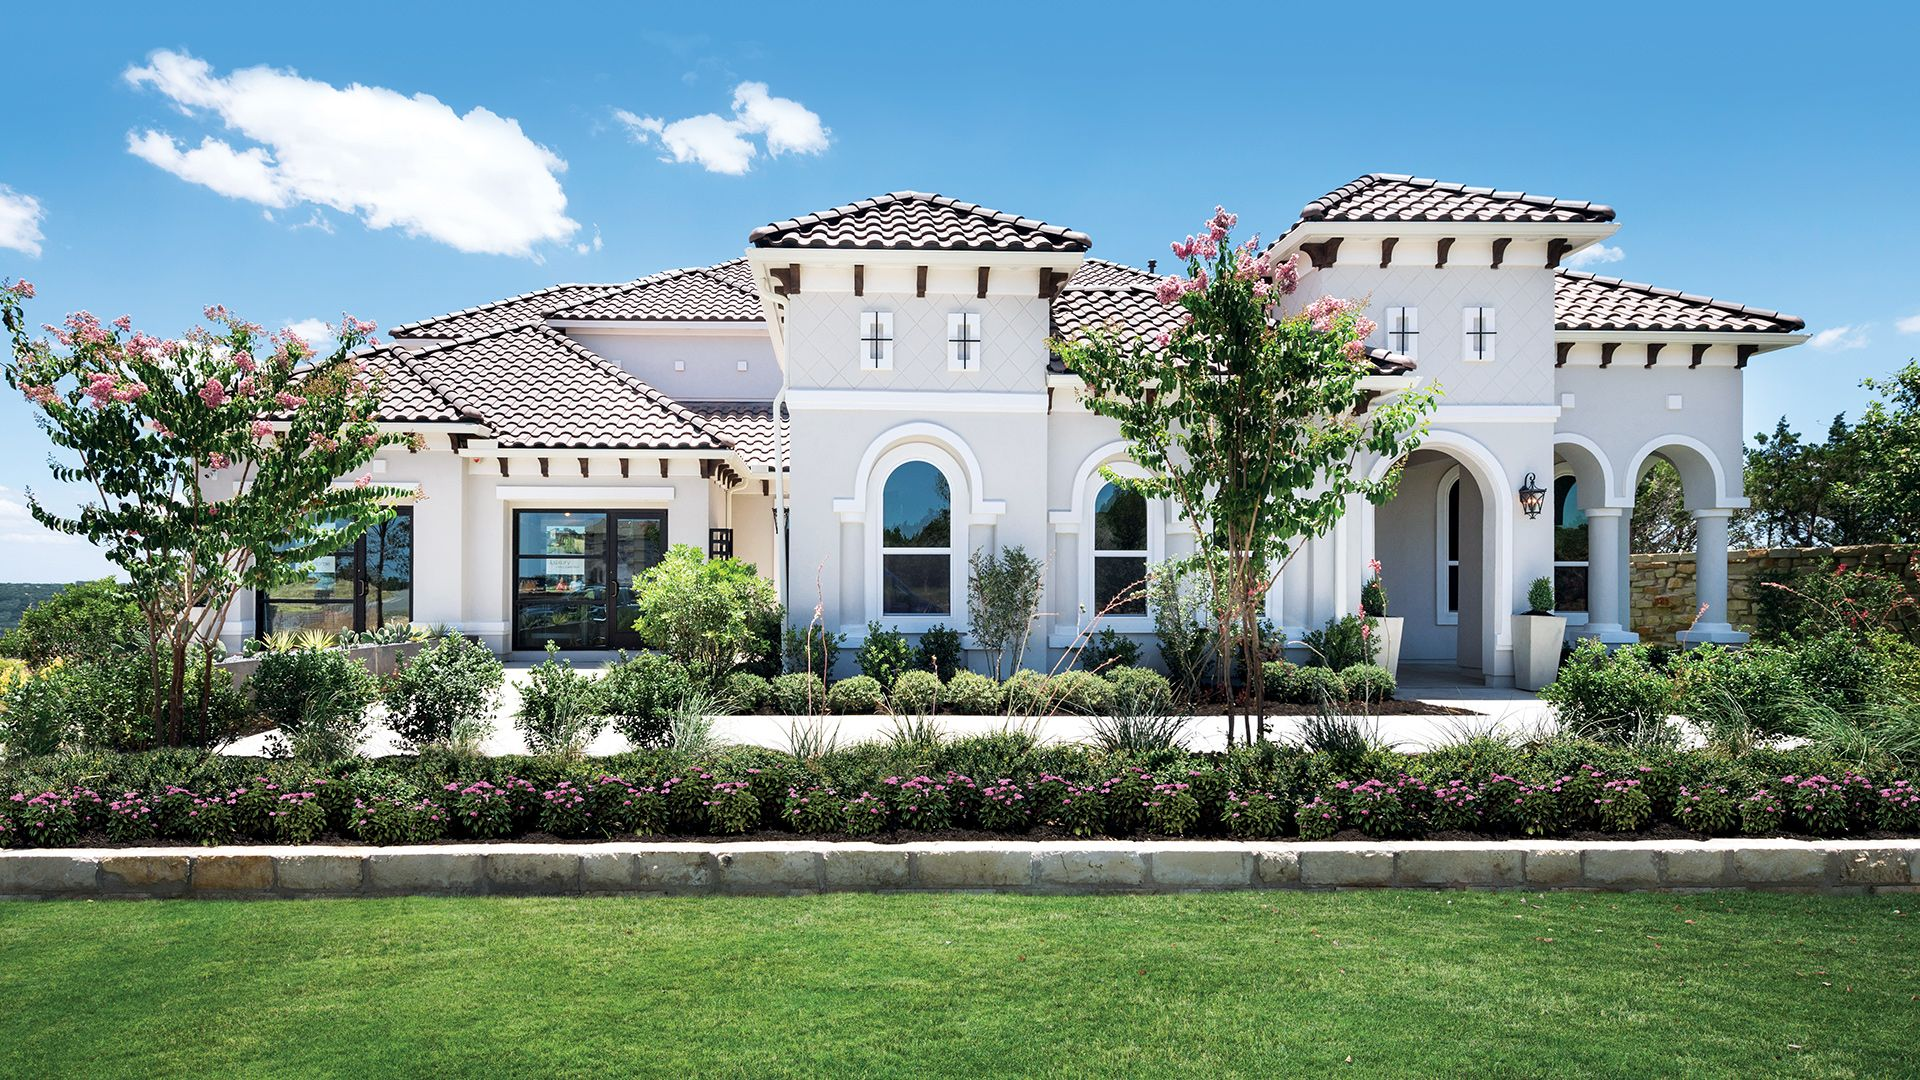 Leander tx new homes for sale travisso florence